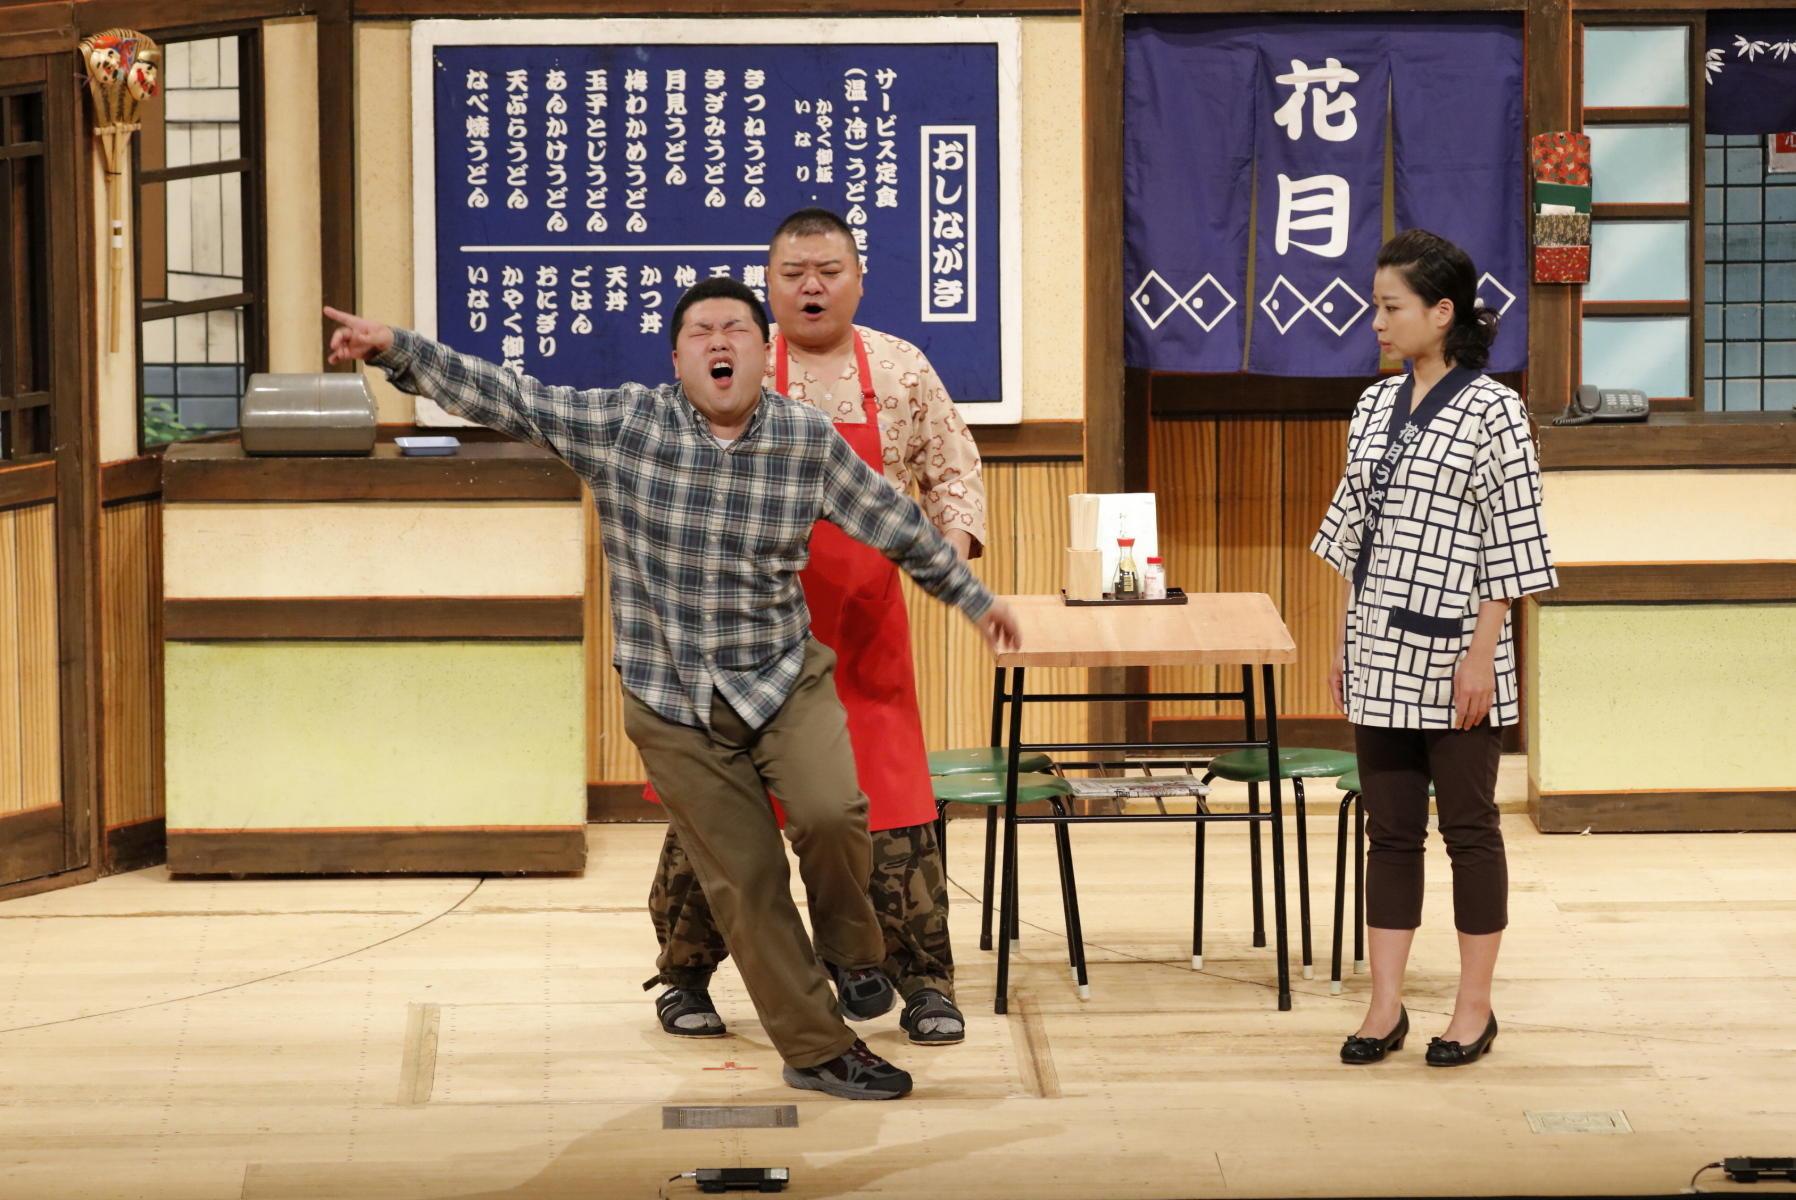 http://news.yoshimoto.co.jp/20160929213953-f6cf21992a081dd2beec696ecb1210bda02de498.jpg